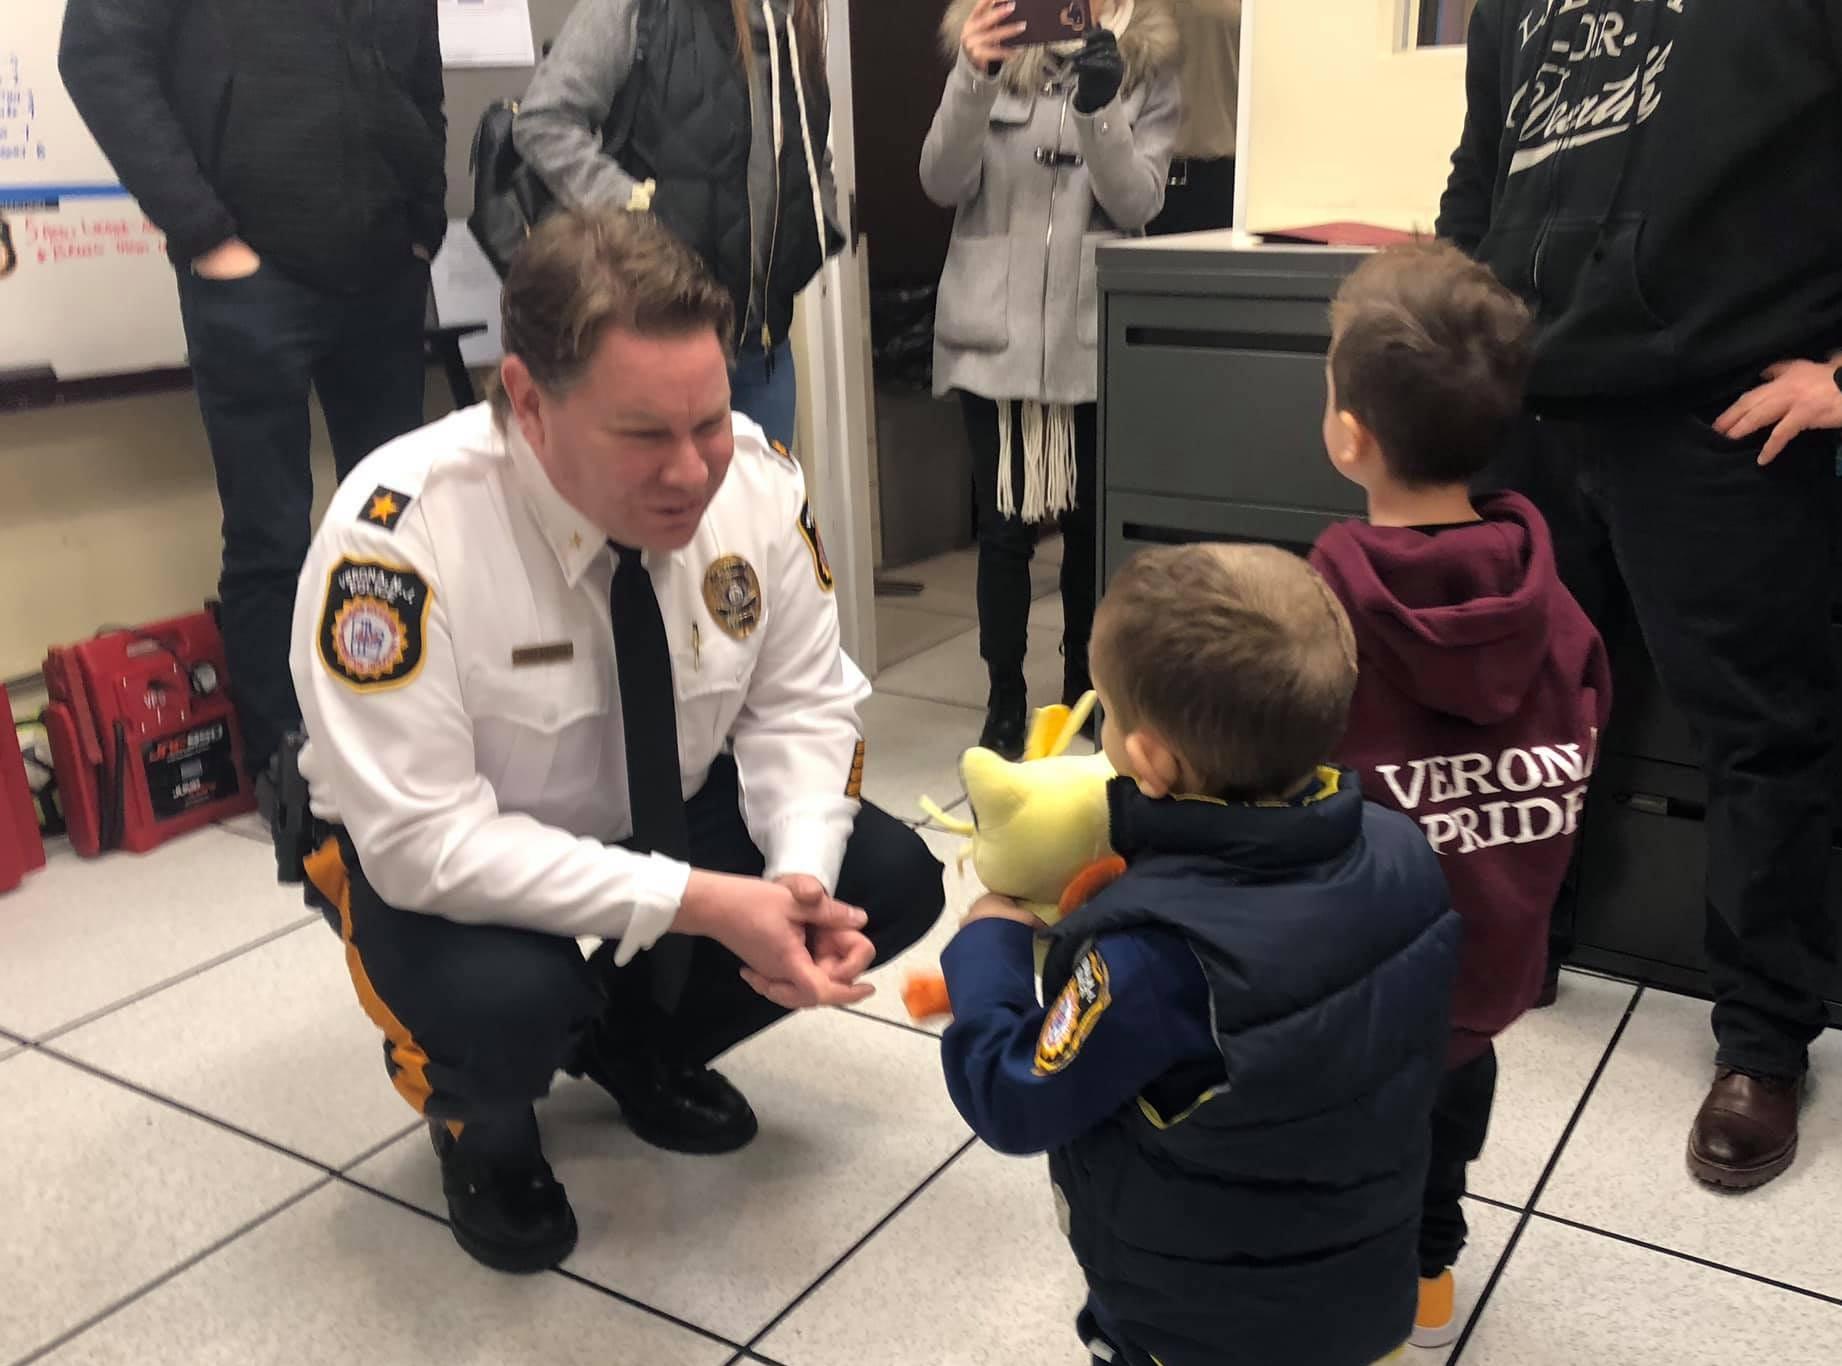 Verona Police Chief Chris Kiernan meets with Micco LaRosa and his family Jan. 20, 2019.